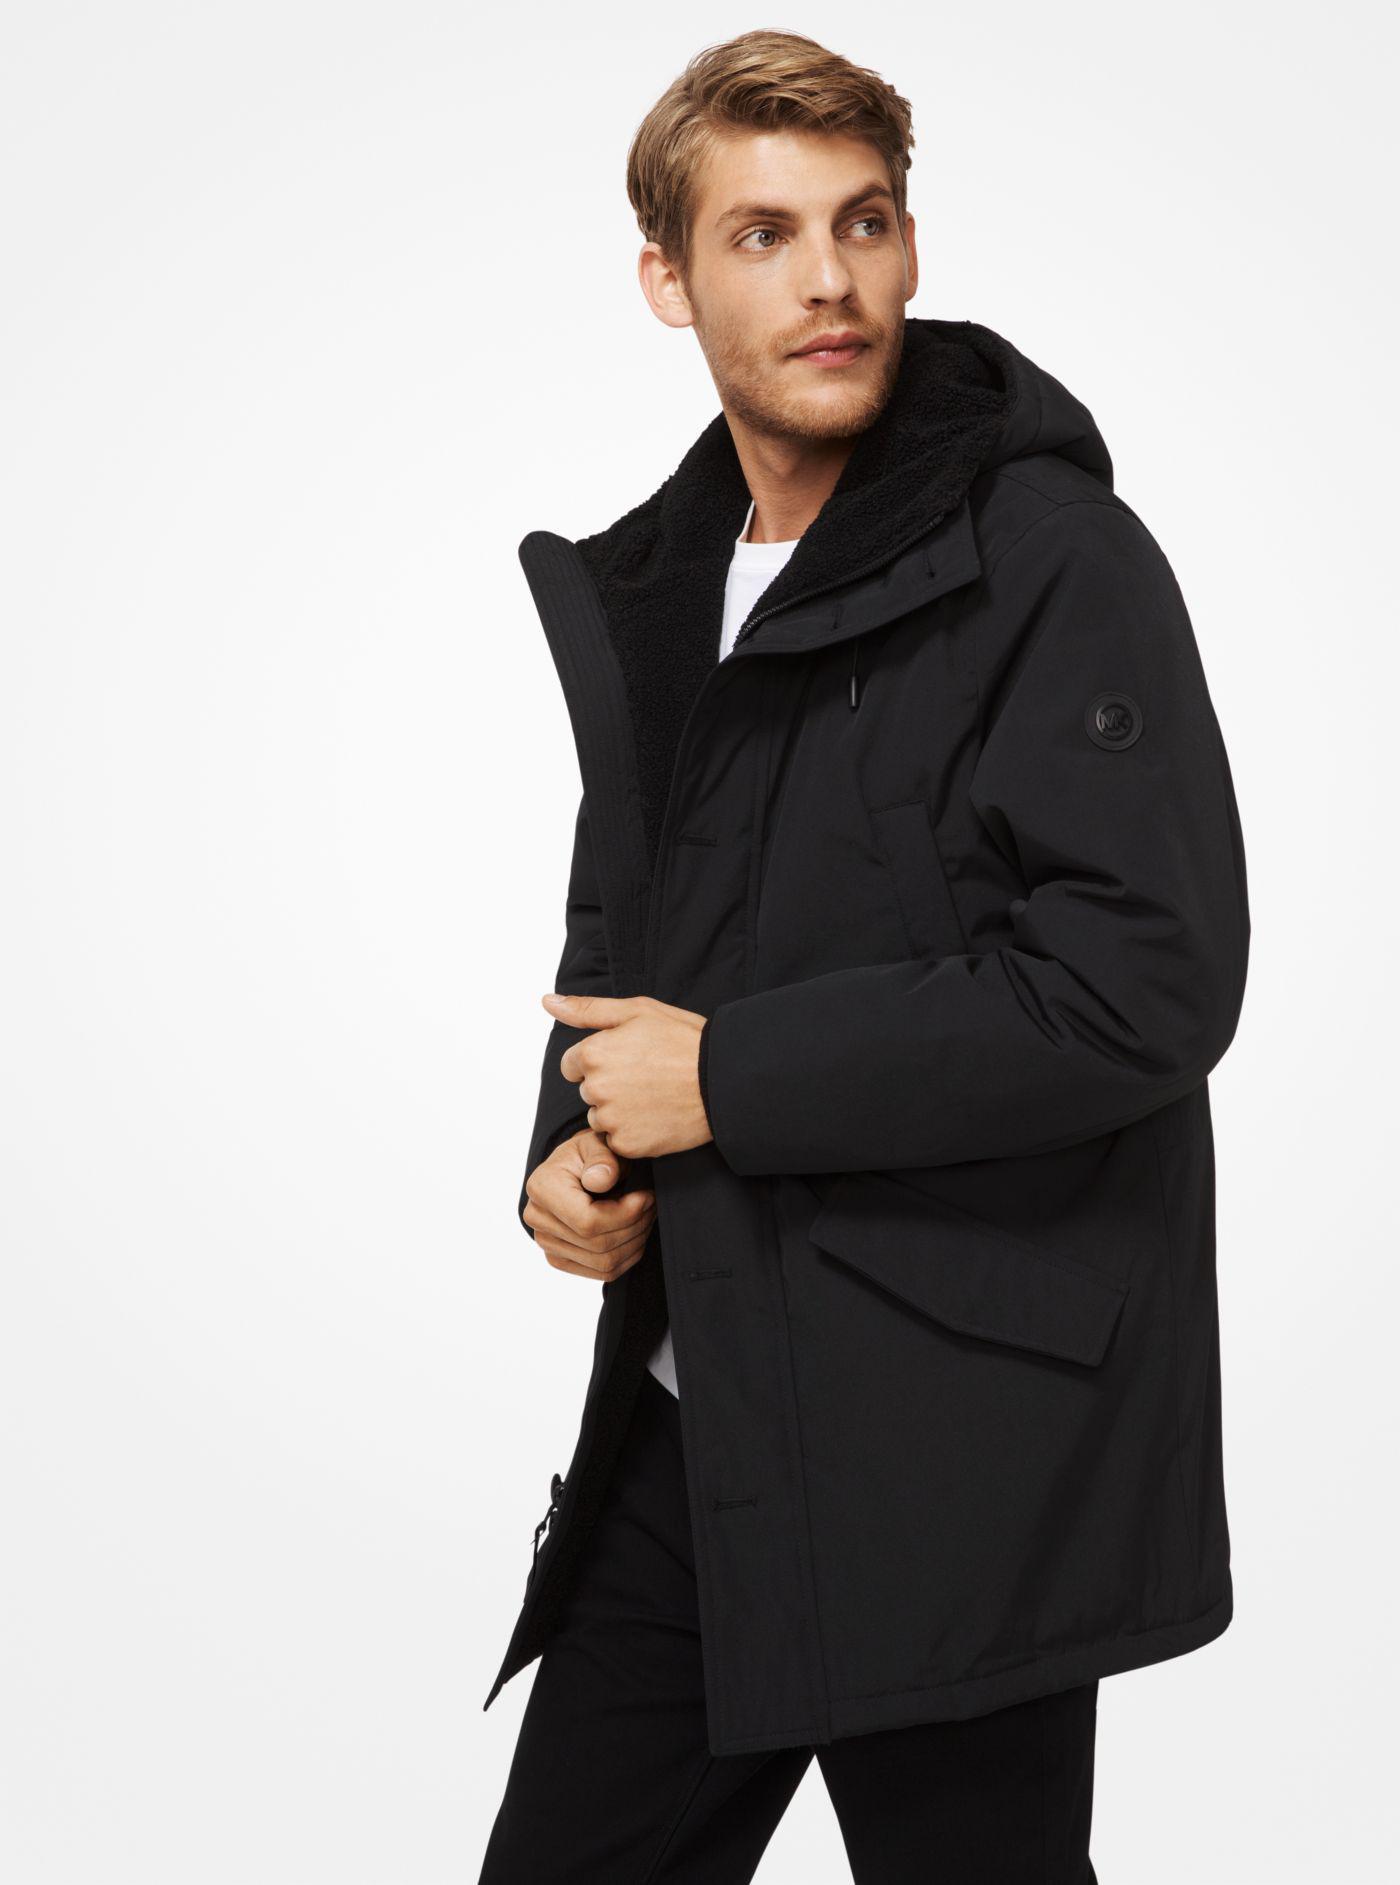 7487816a47ea Lyst - Michael Kors Sherpa-lined Parka in Black for Men